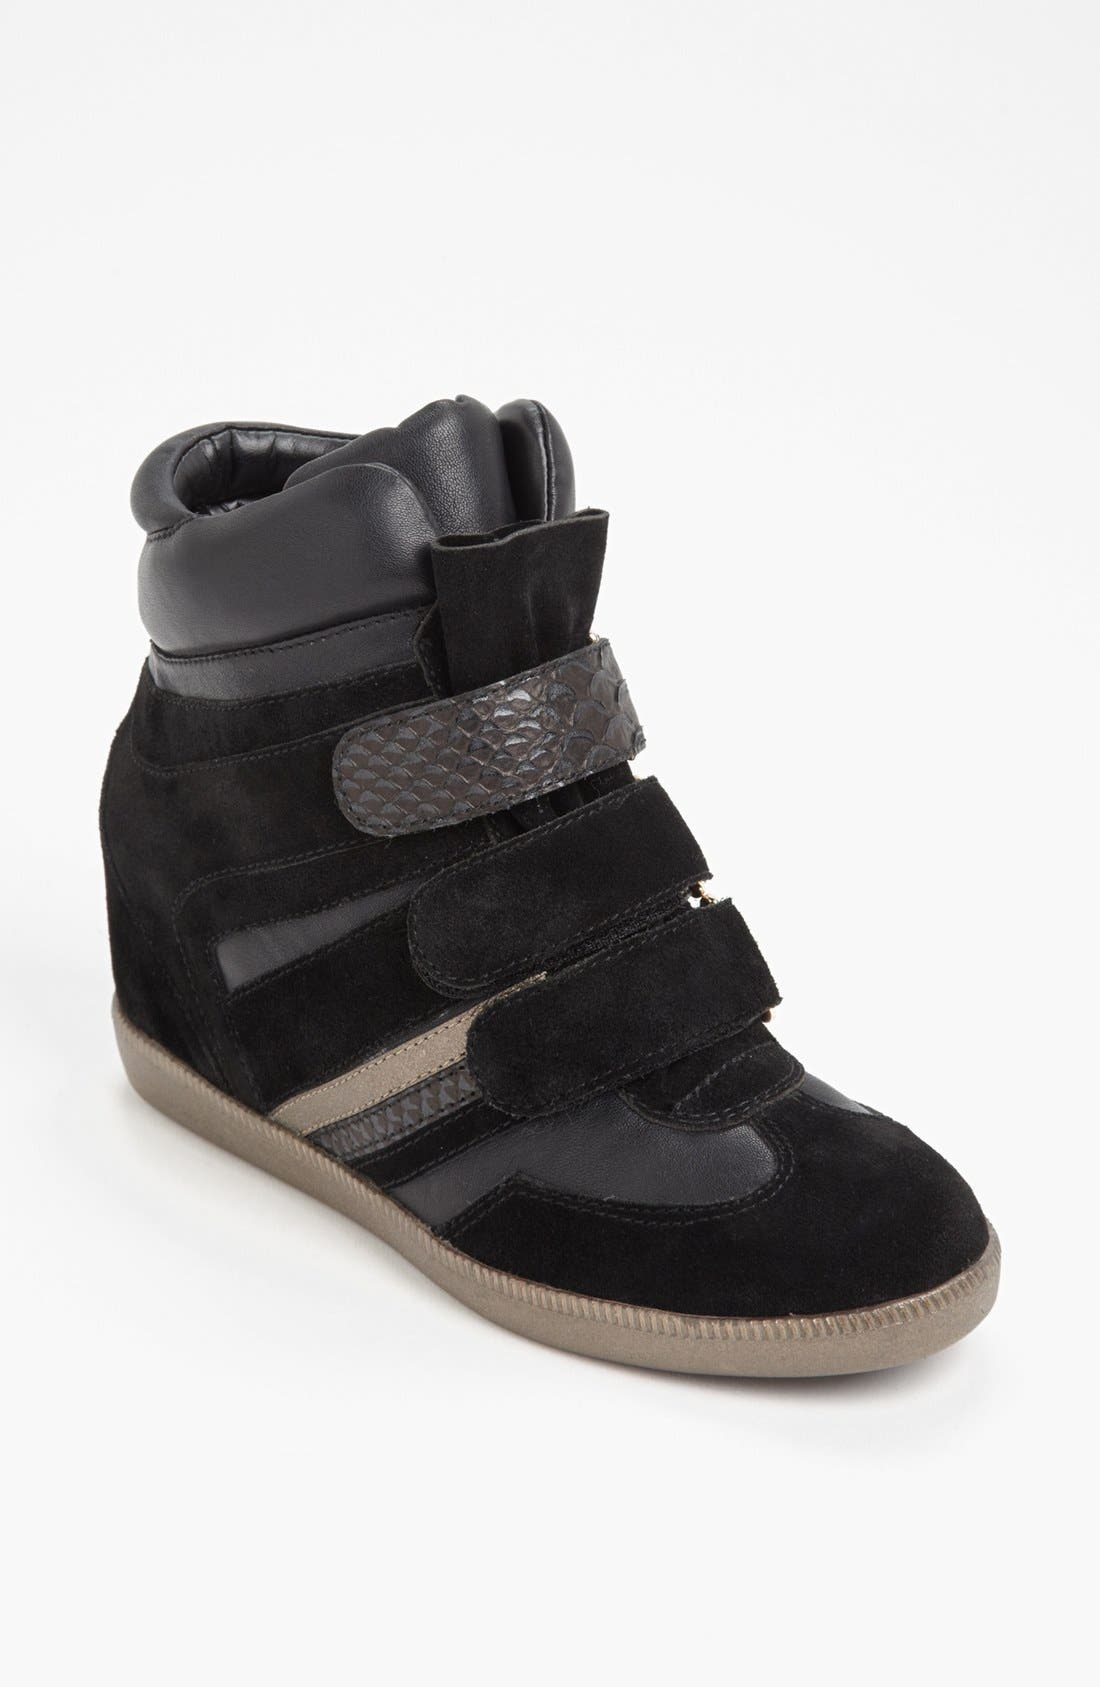 Alternate Image 1 Selected - BCBGeneration 'Anthony' Wedge Sneaker